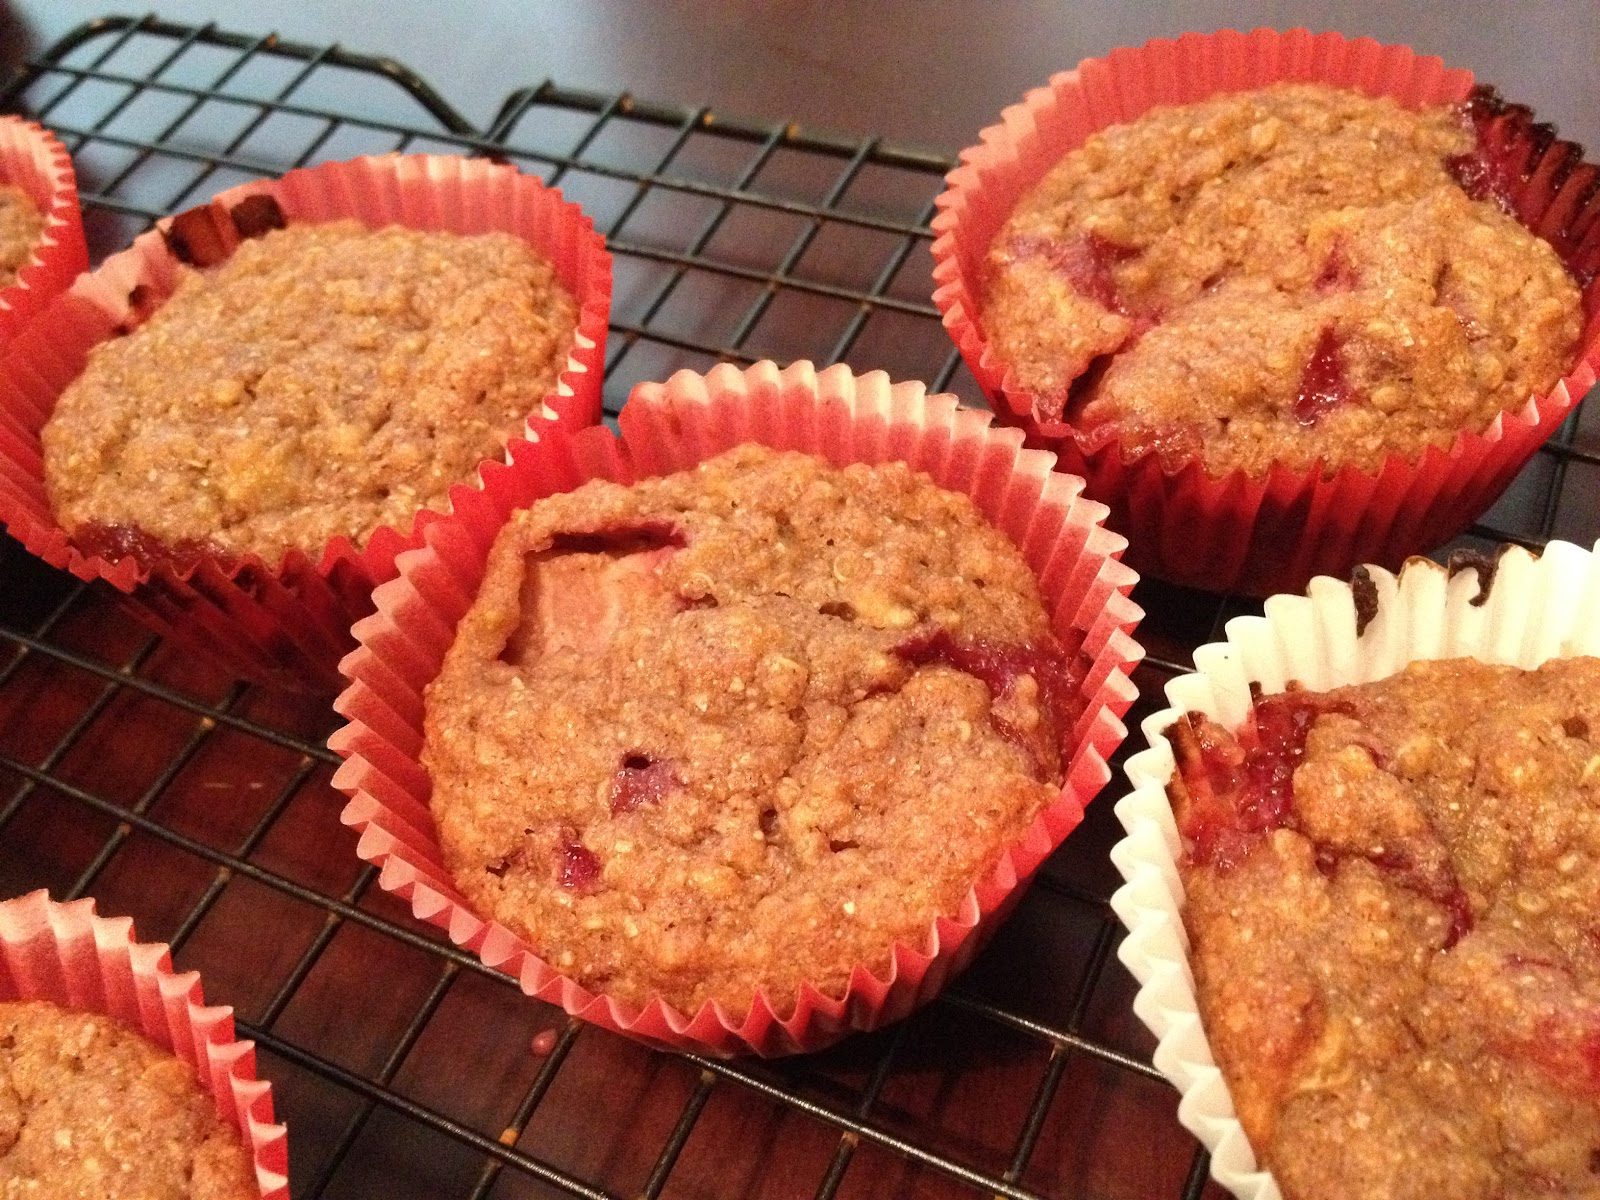 ... Mess Their Kitchen: Eggless Sunday: Strawberry Banana Quinoa Muffins